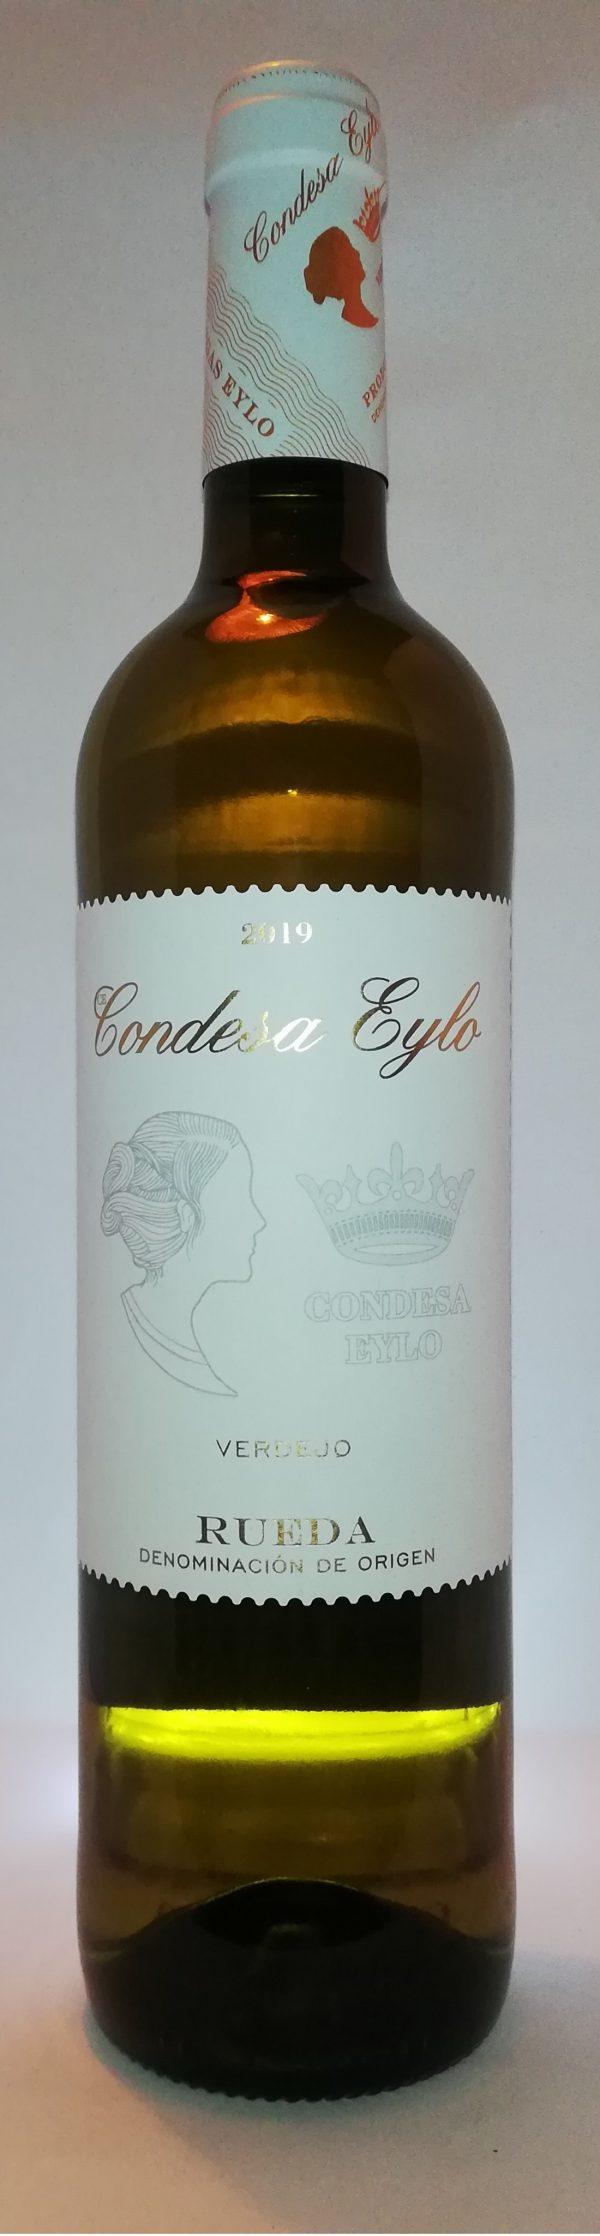 Condesa Eylo